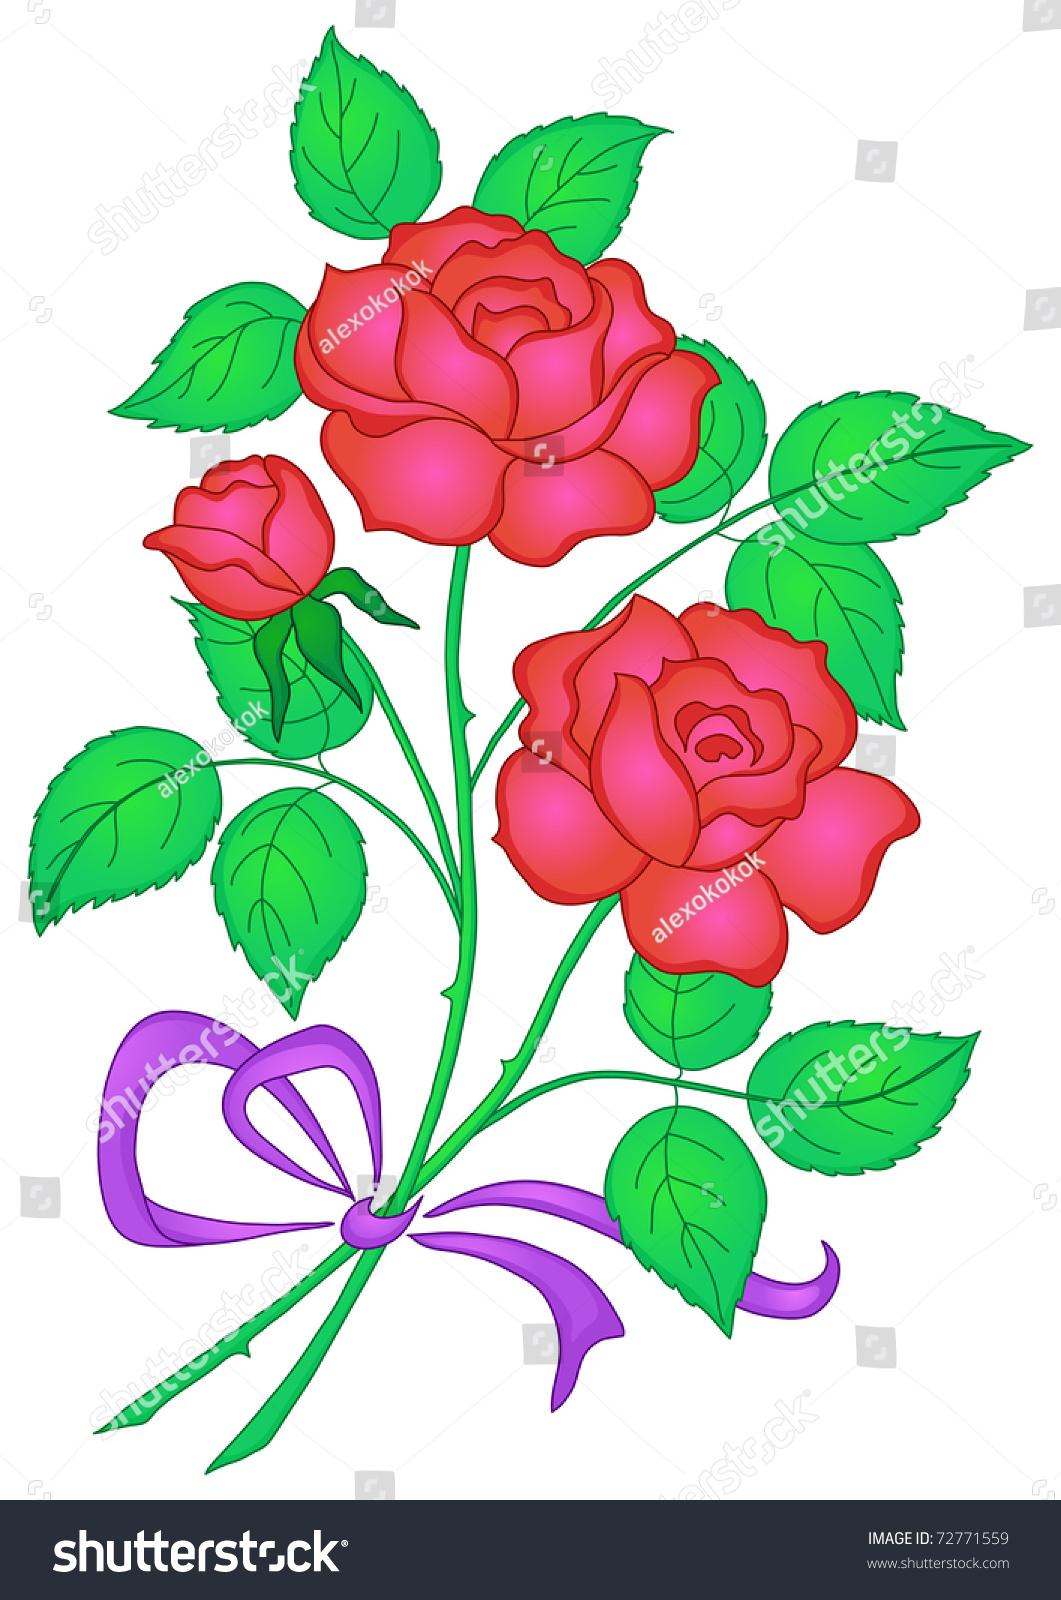 Flowers Rose Bouquet Love Symbol Floral Stock Illustration 72771559 ...